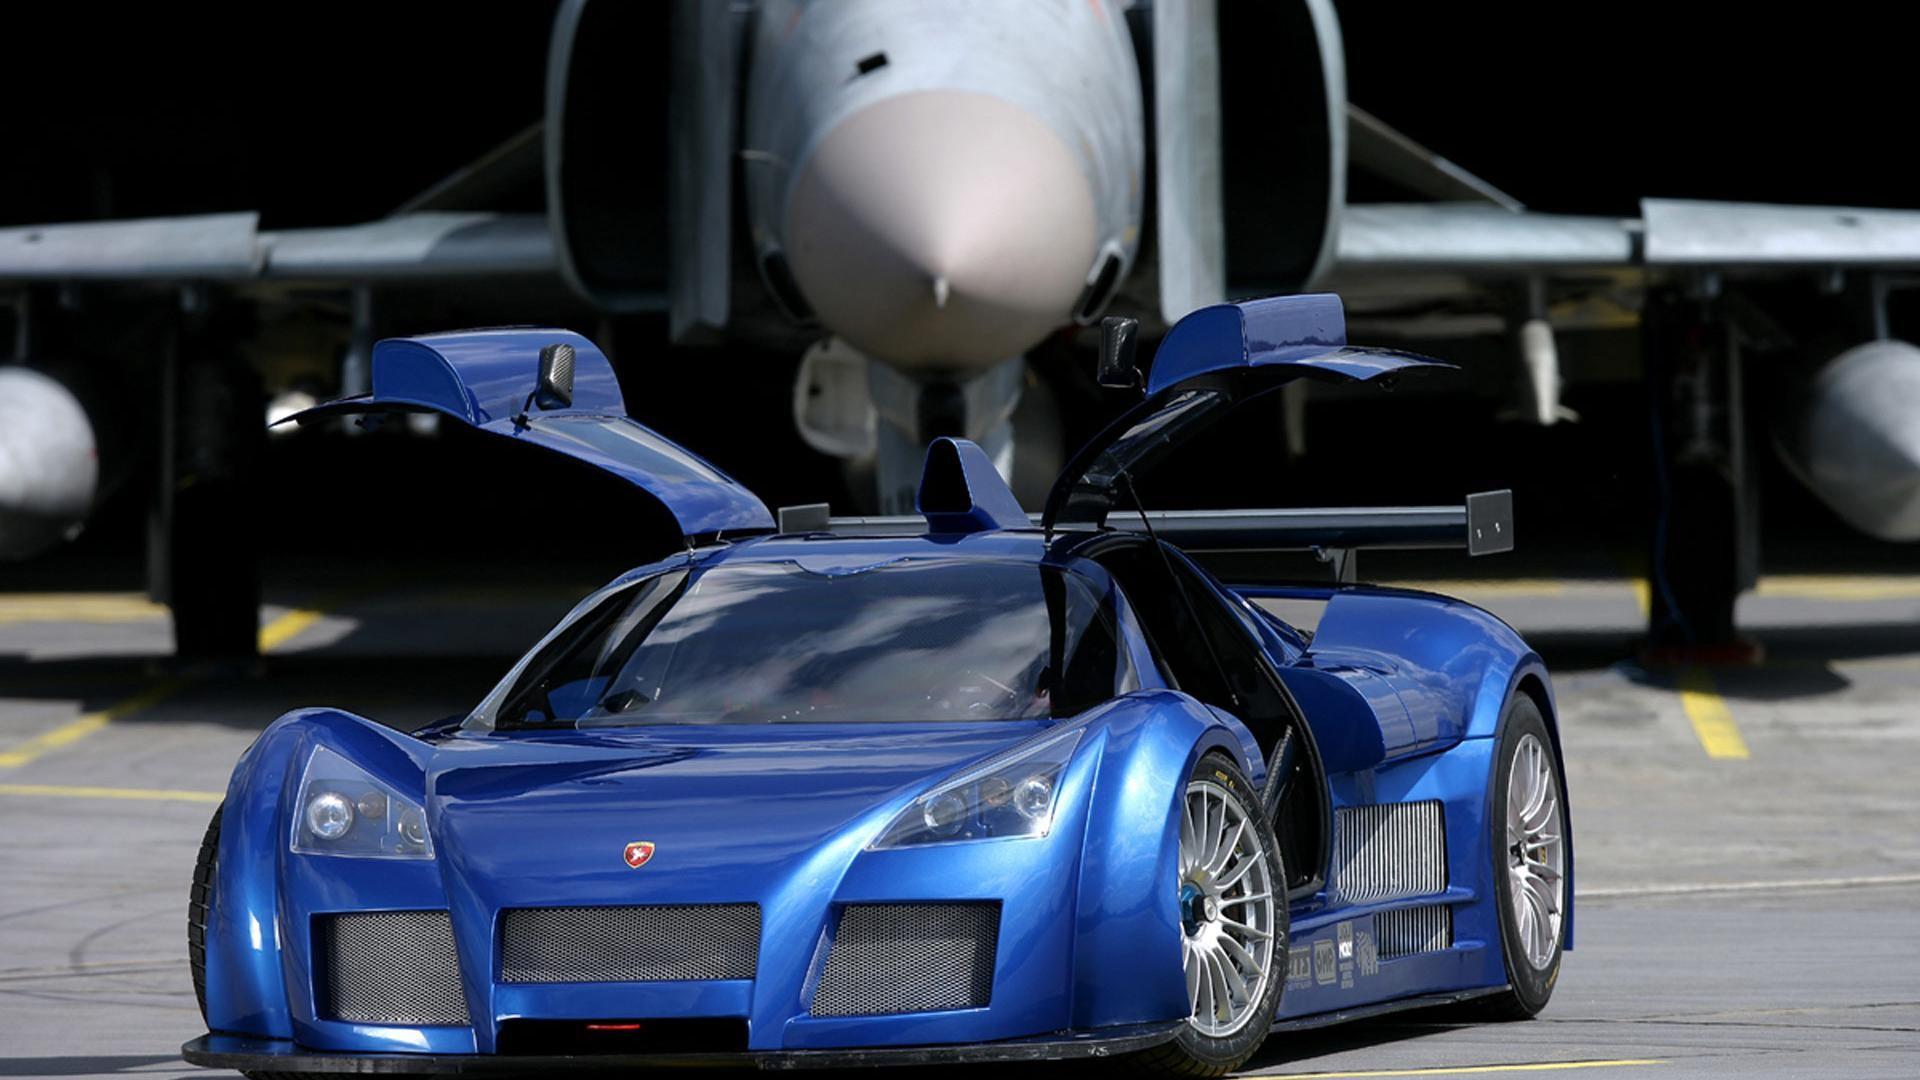 apollo sports car - 1024×683